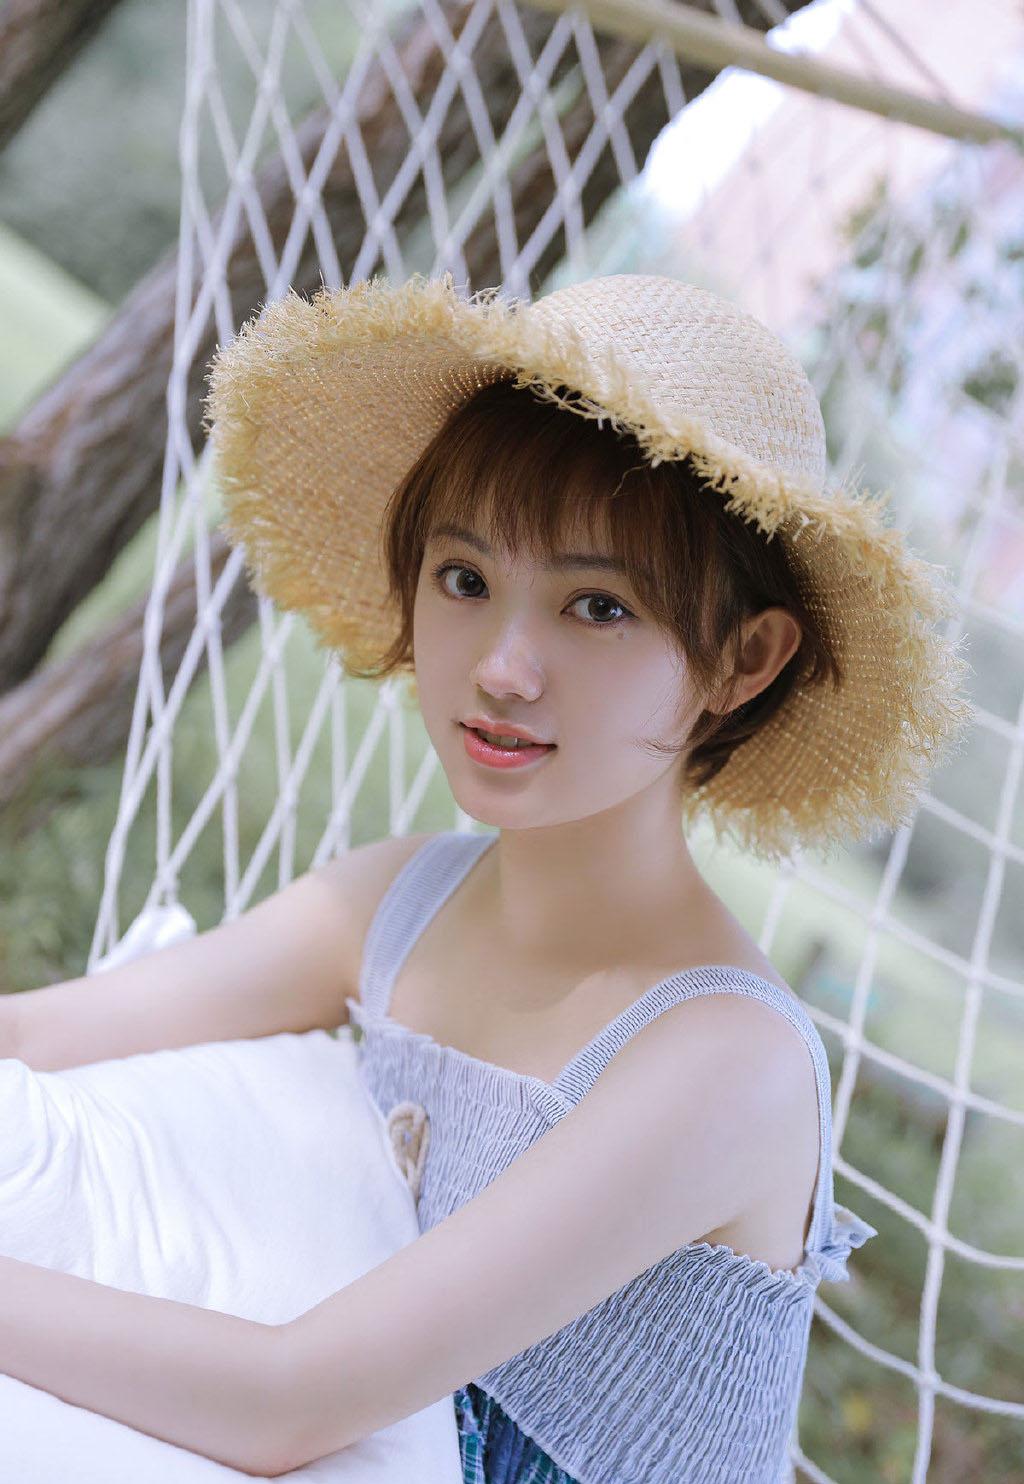 jk水手服清纯美少女